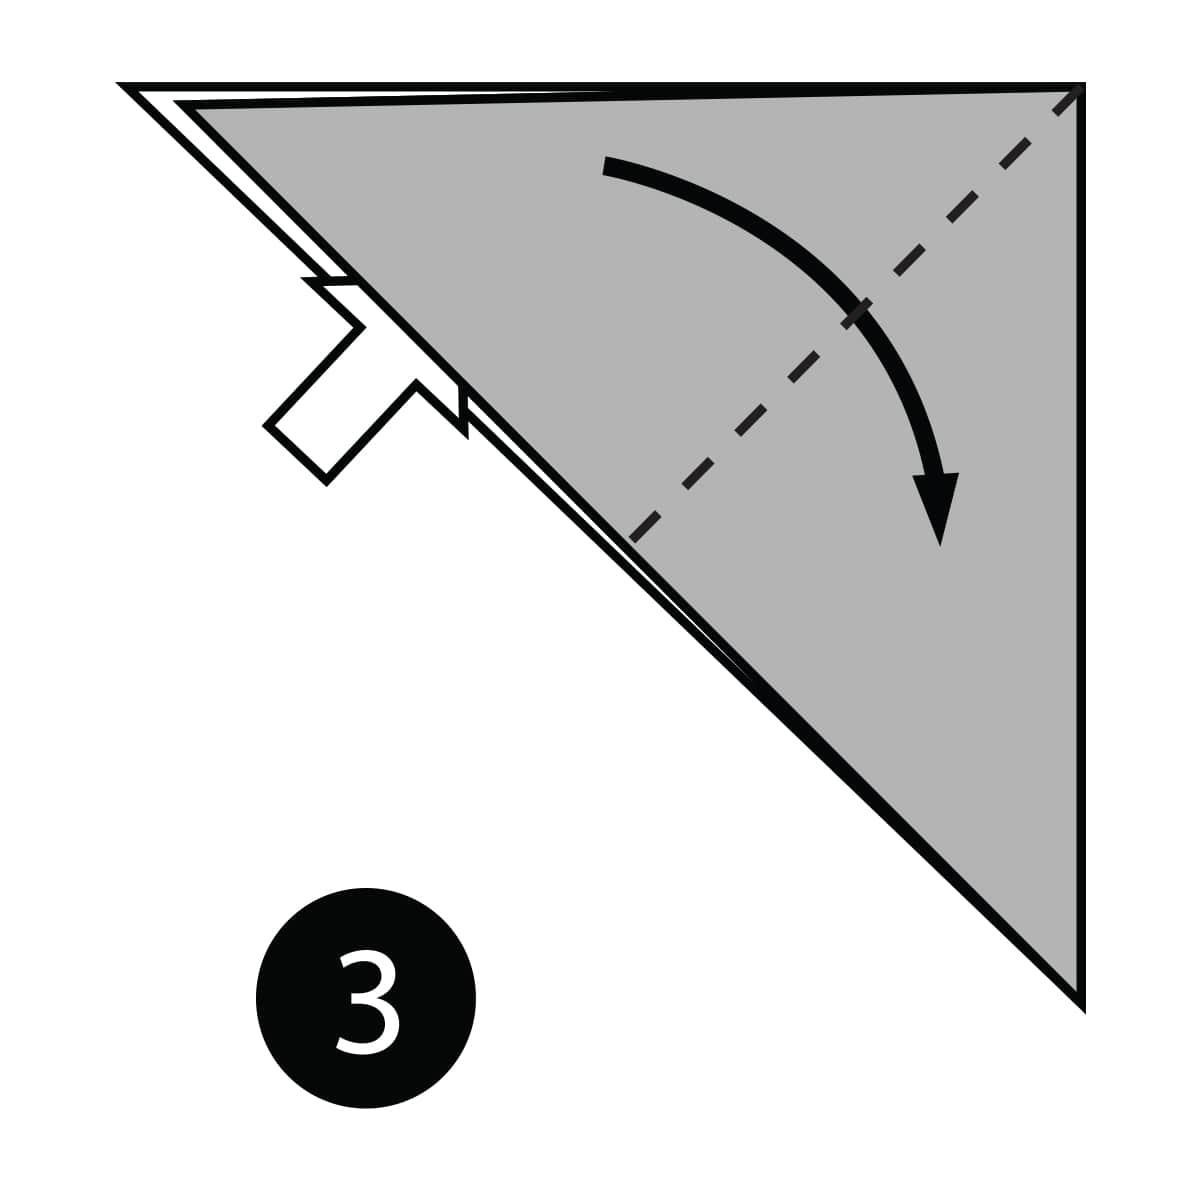 Origami Swallow | 1200x1200